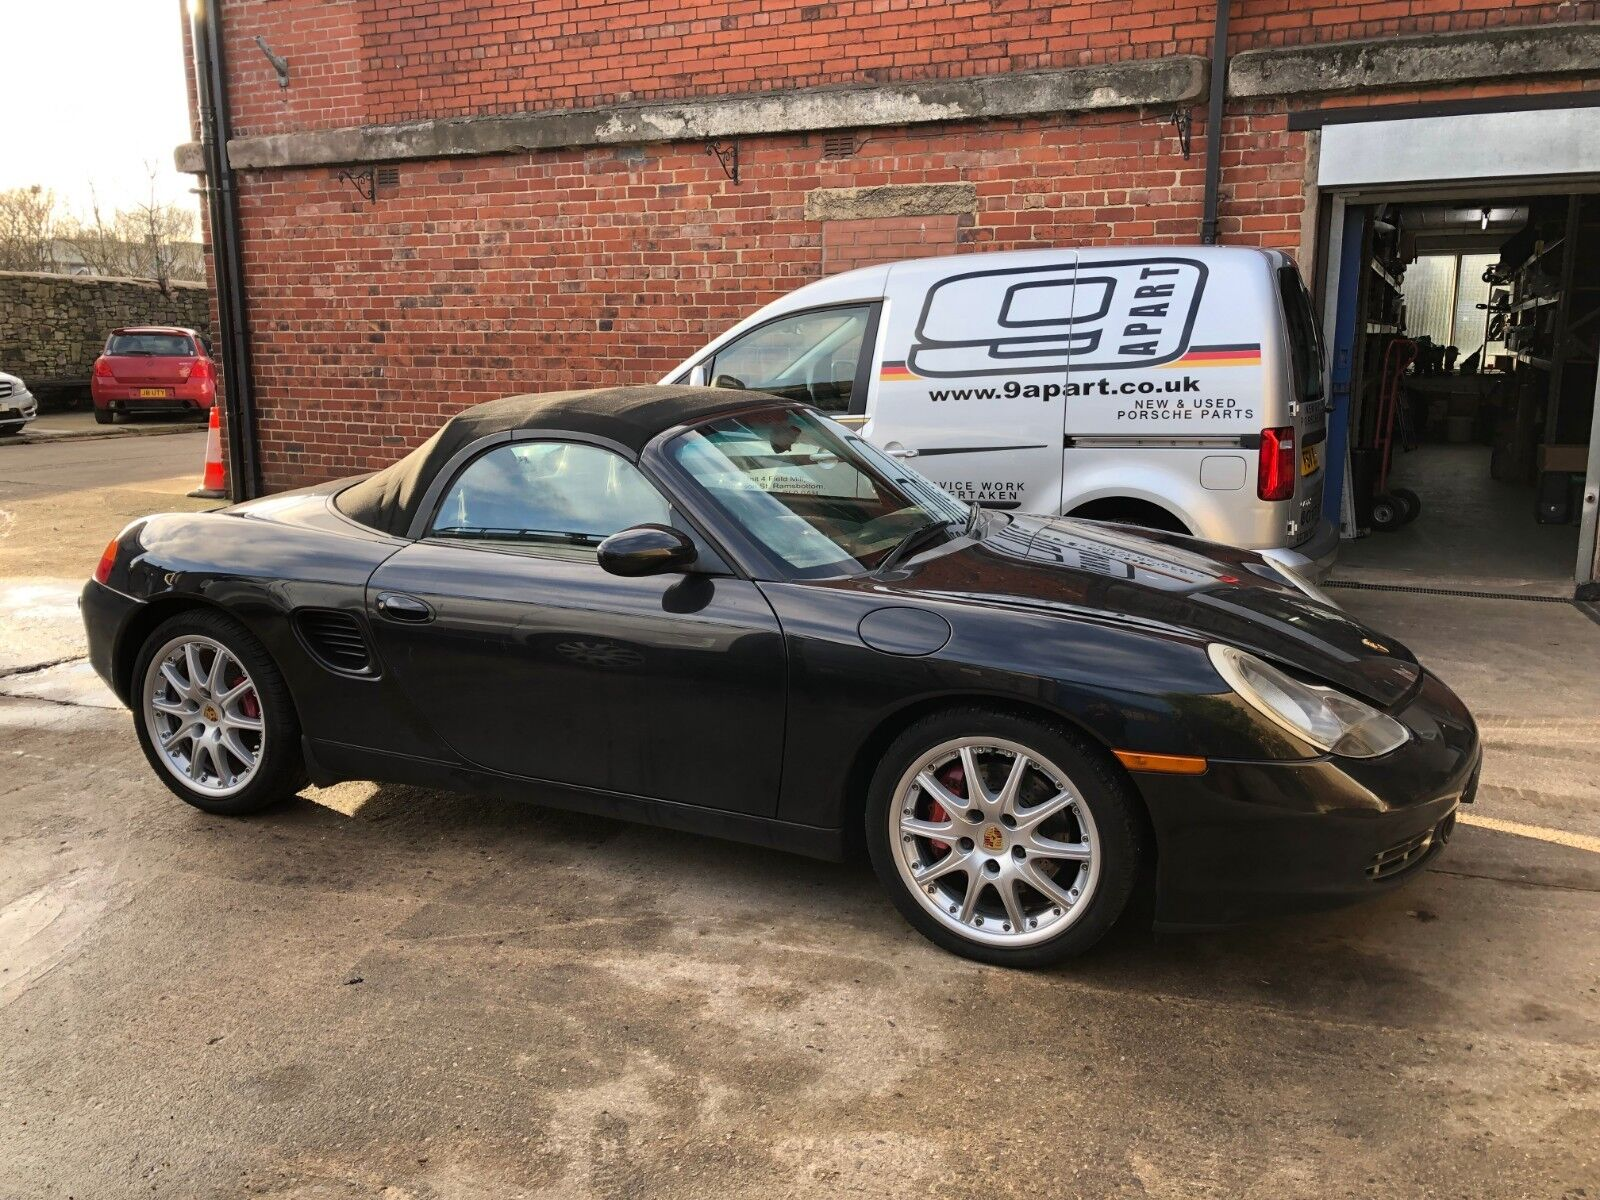 2002 Porsche 986 Boxster S Breaking For Wheel Bolt - GT3 Wheels Sport Seats